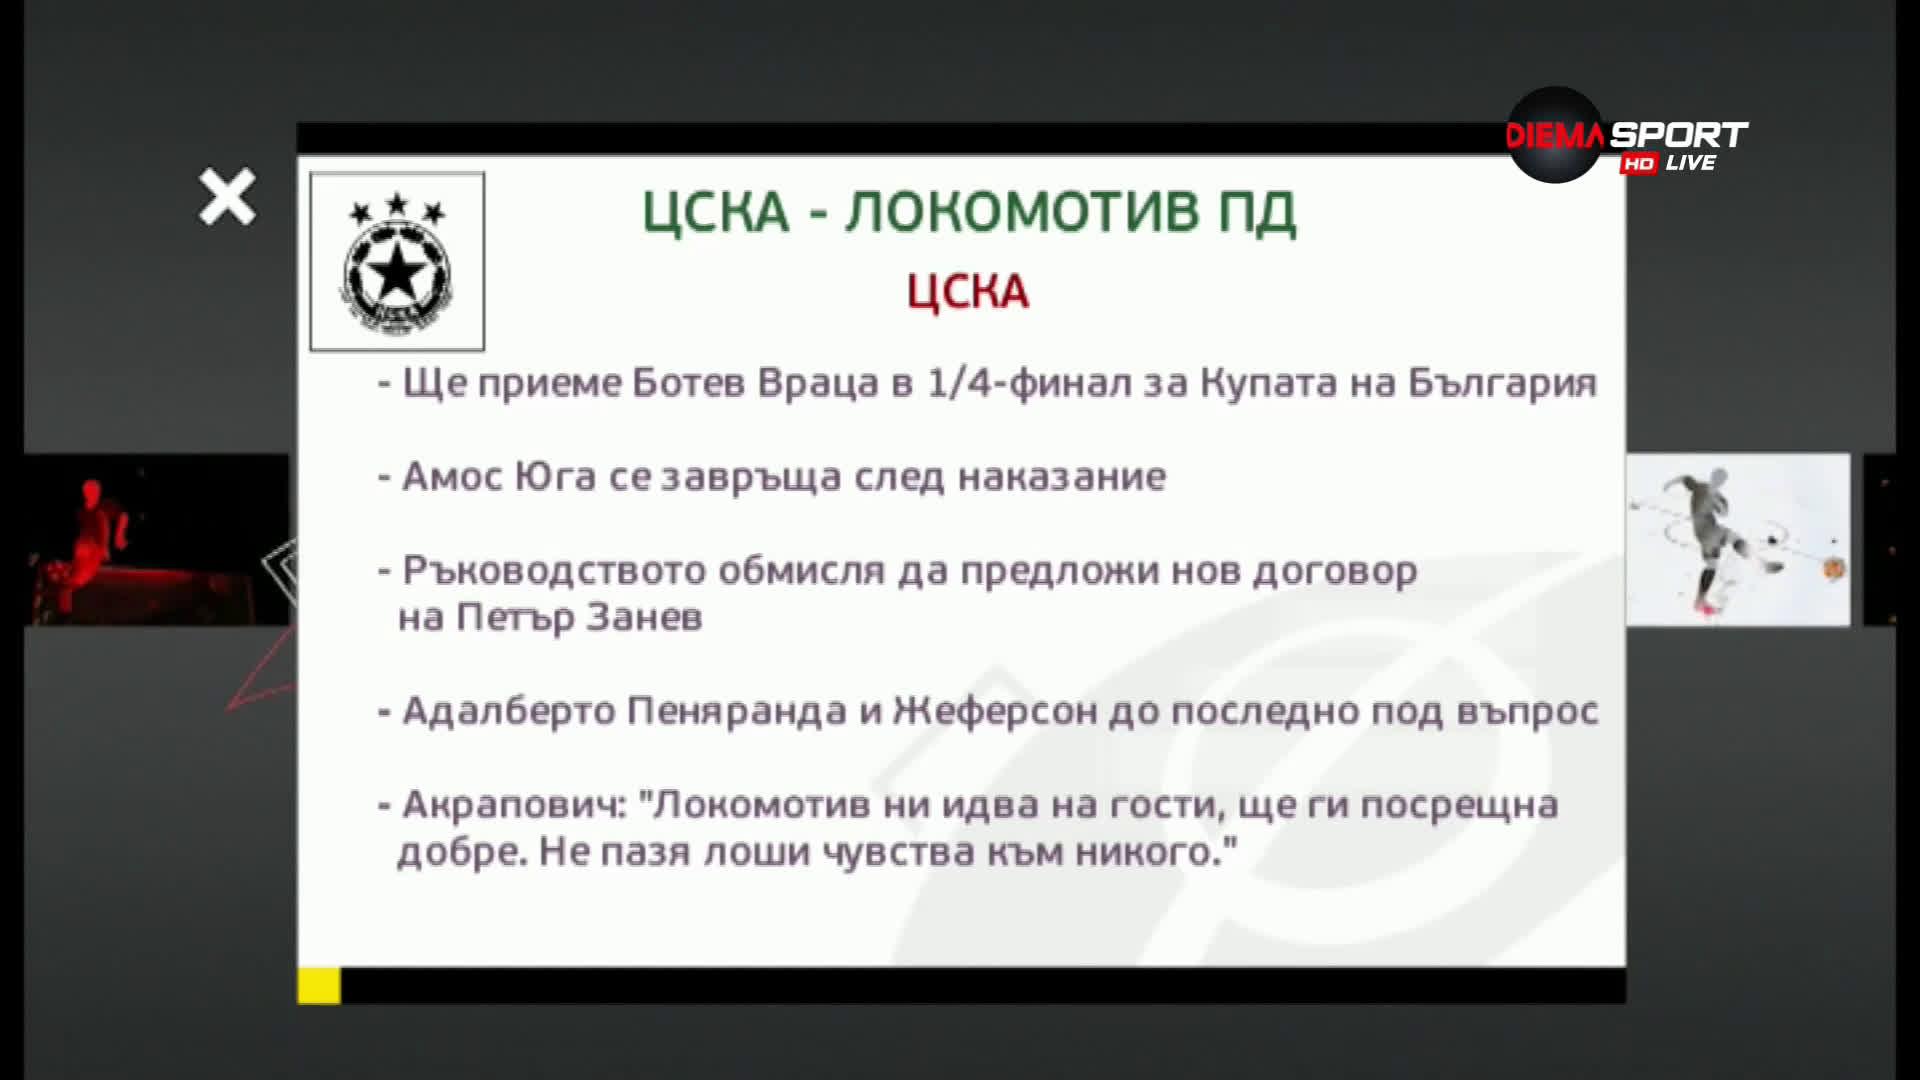 Преди ЦСКА - Локомотив Пд